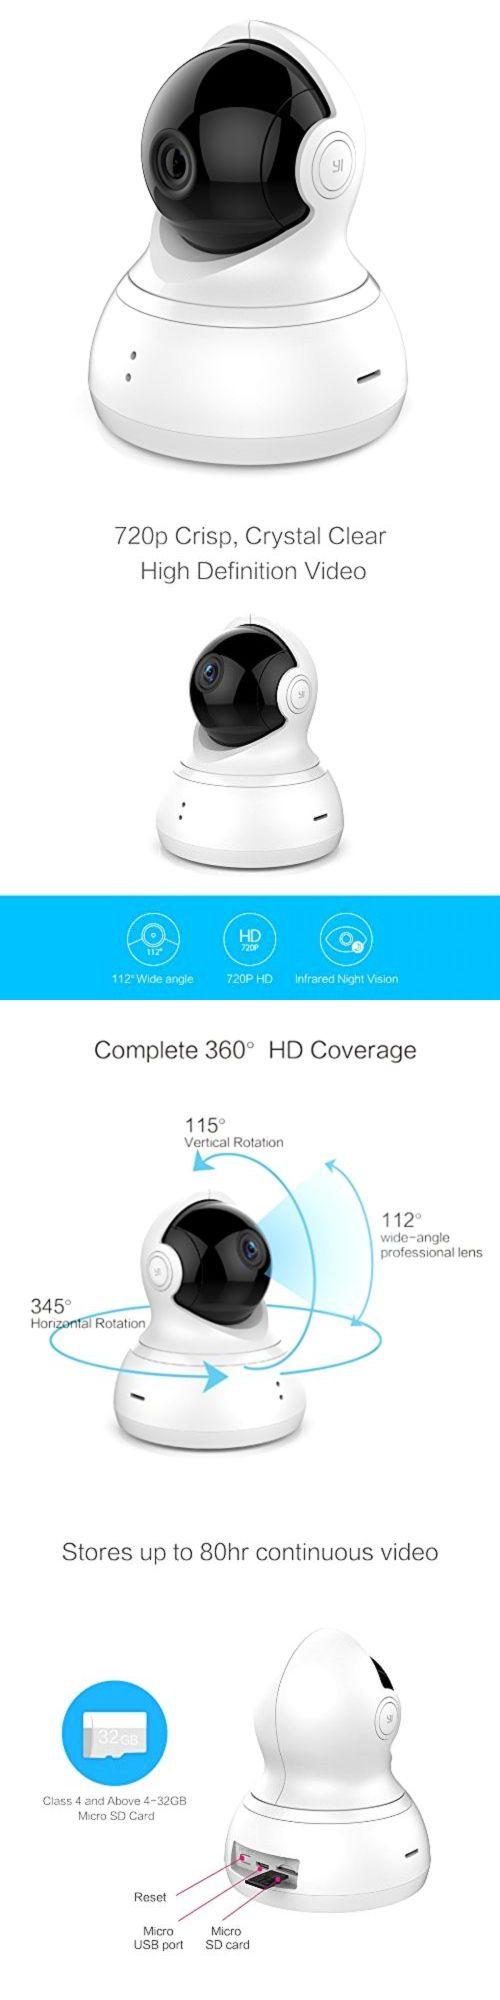 Security Cameras: Yi Dome Camera Pan/Tilt/Zoom Wireless Ip Security  Surveillance System